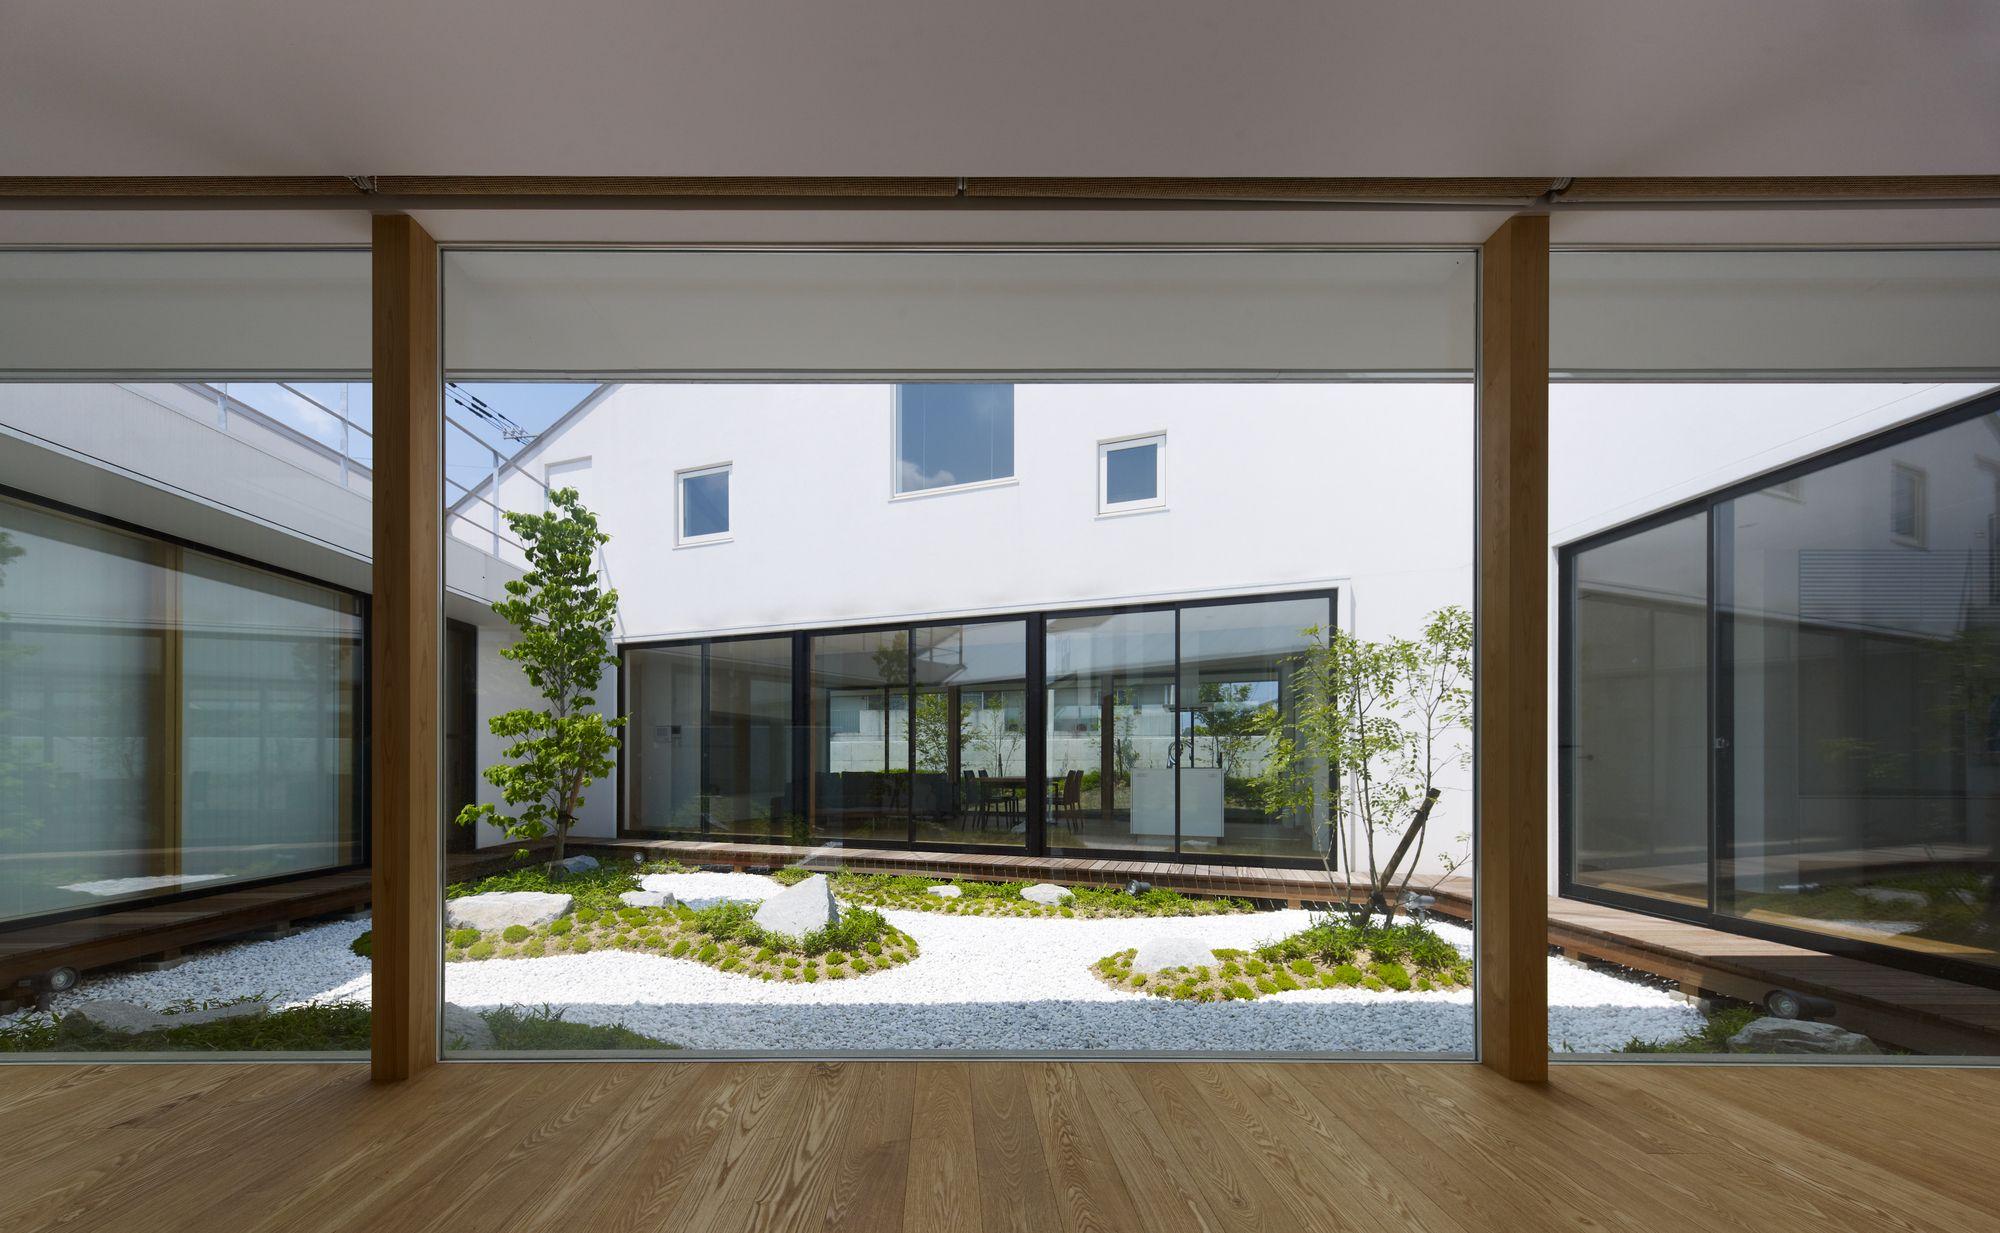 Galeria - Residência em Sanbonmatsu / Hironaka Ogawa - 2